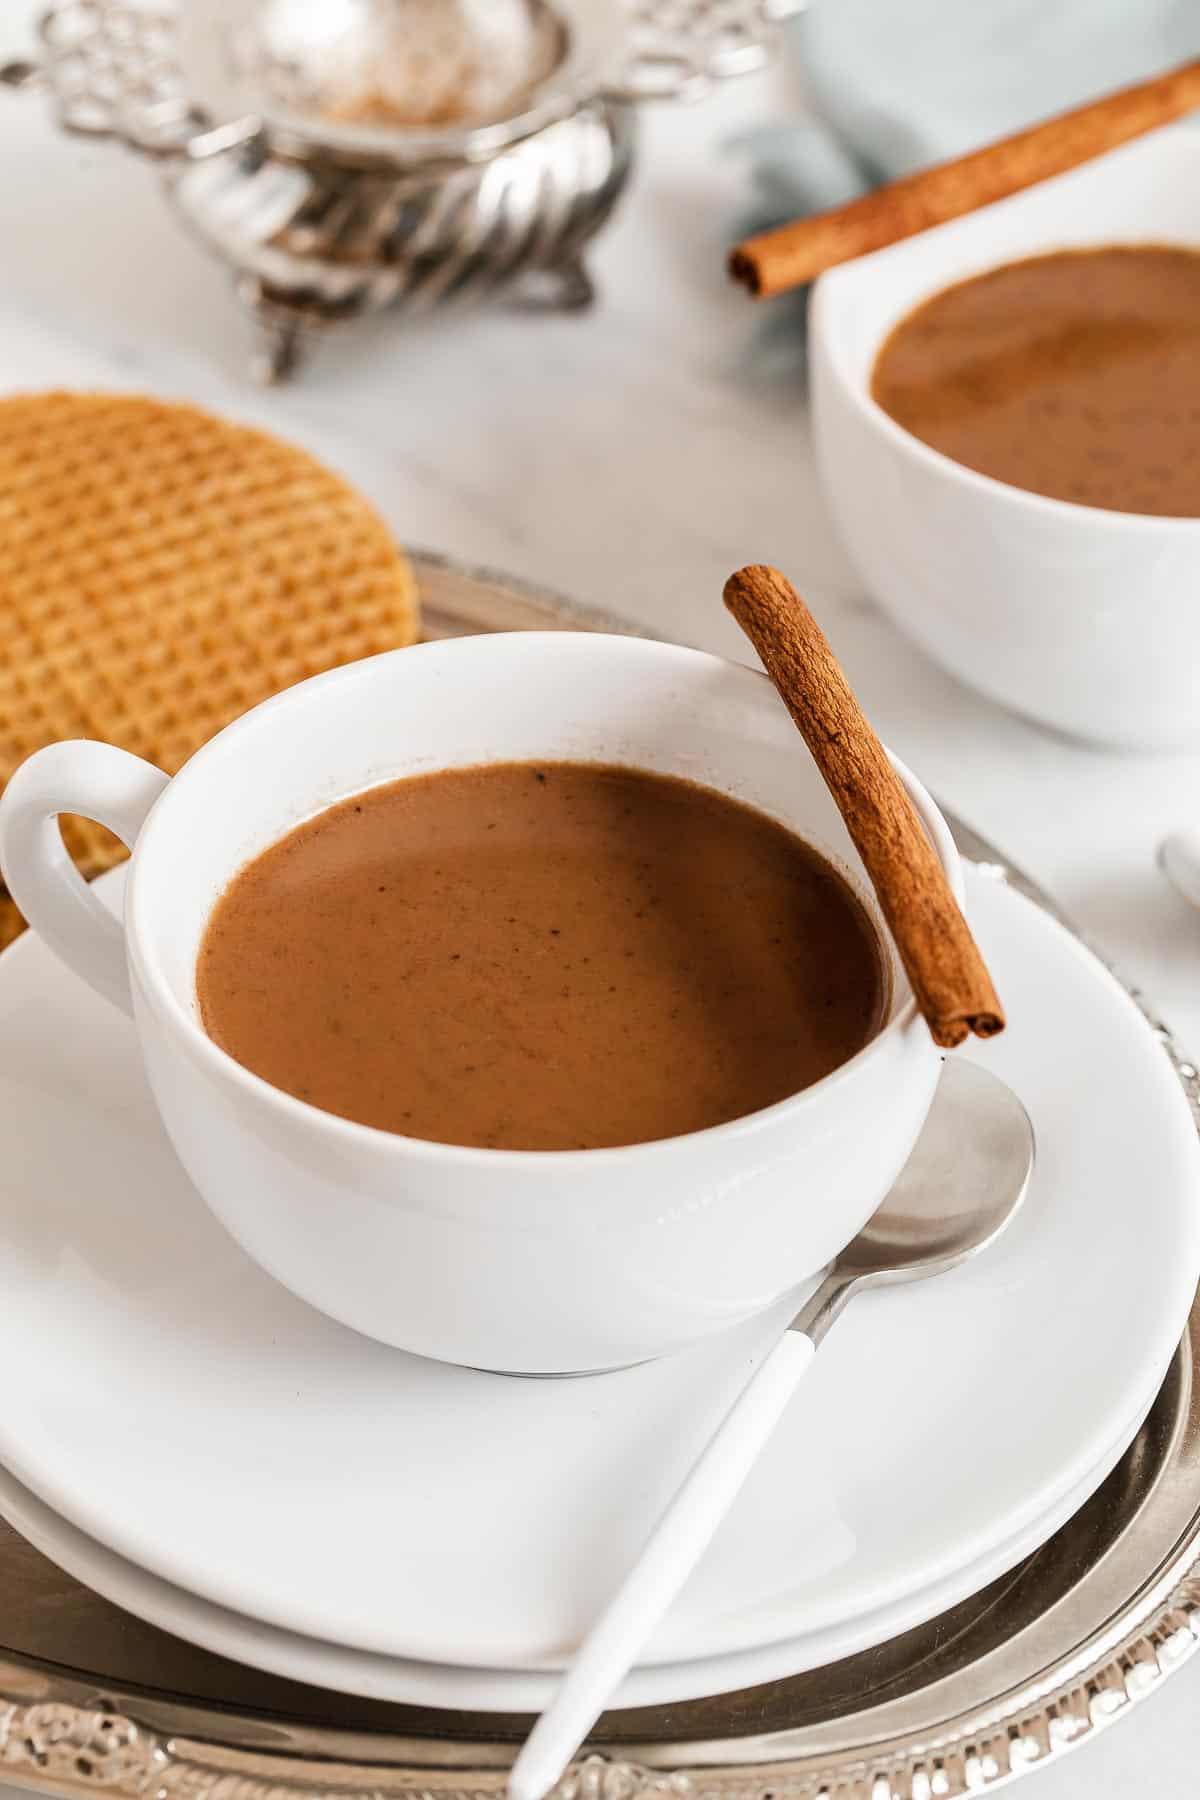 White mug of chai latte with cinnamon stick on edge.